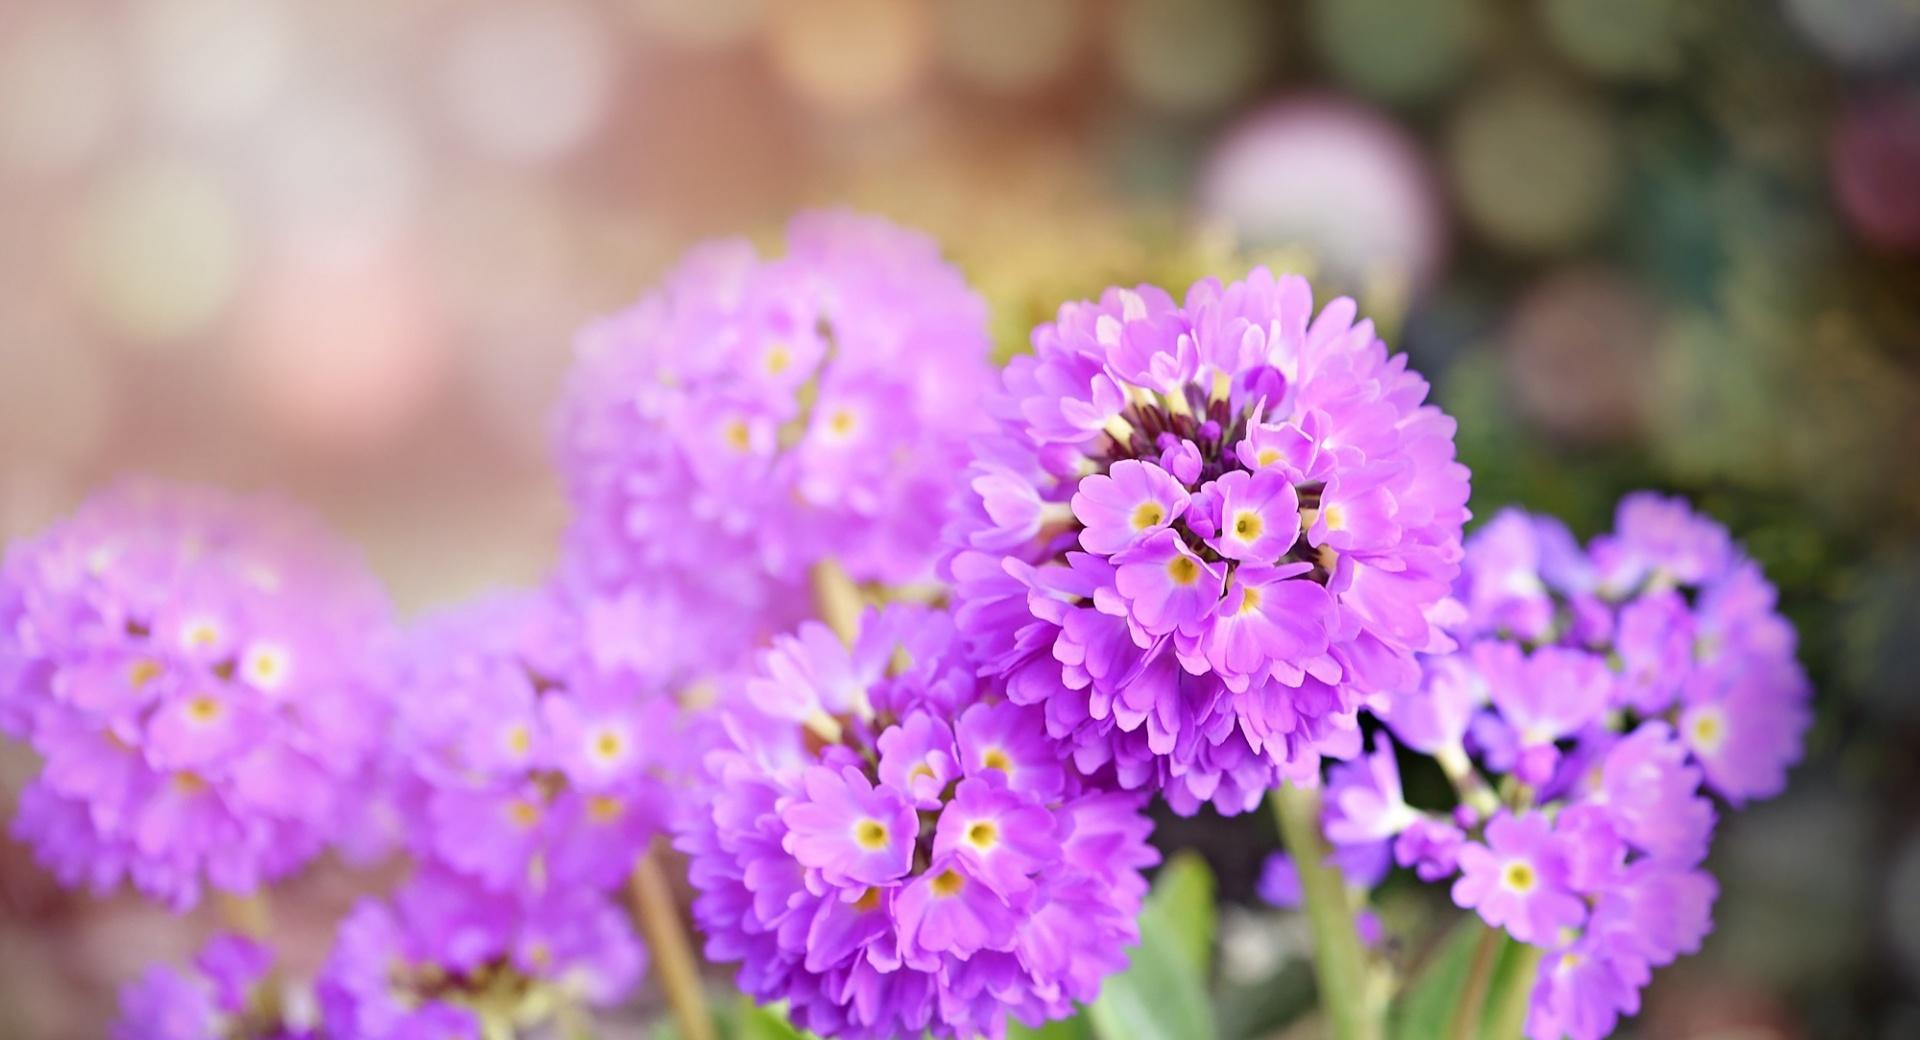 Purple PrimRose Flower wallpapers HD quality